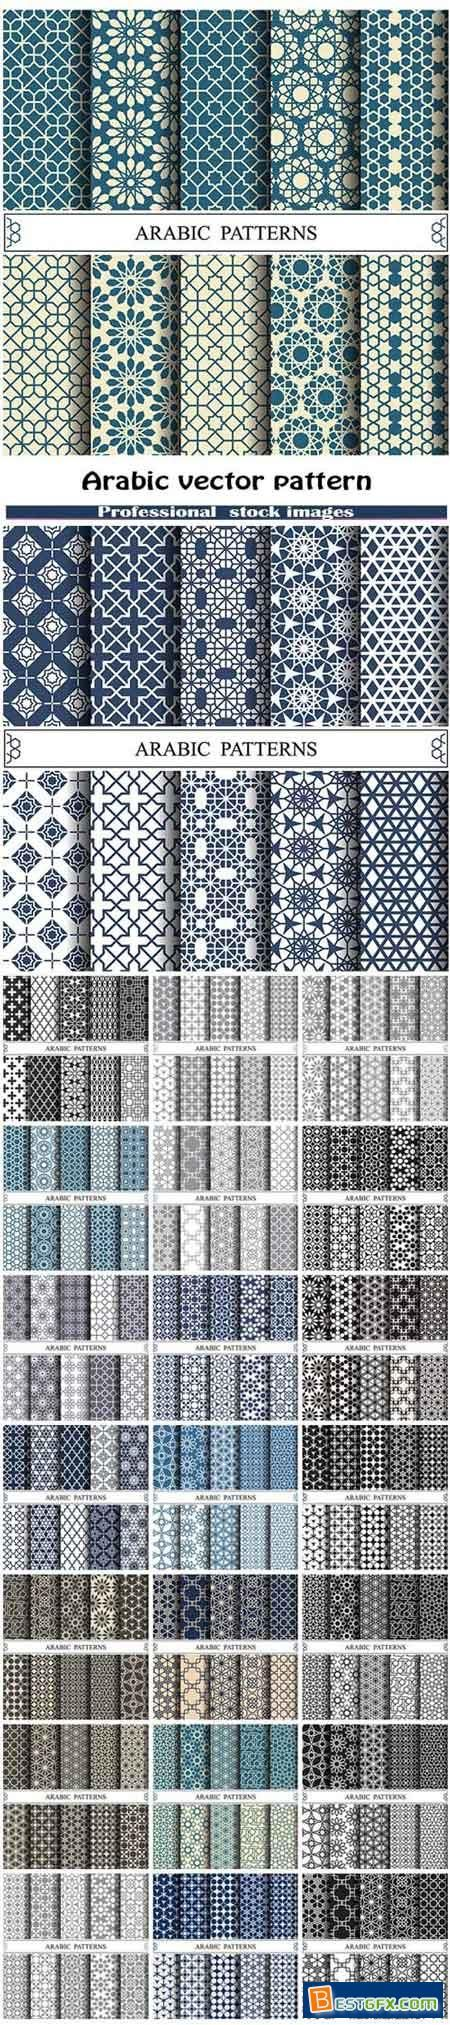 Arabic vector pattern